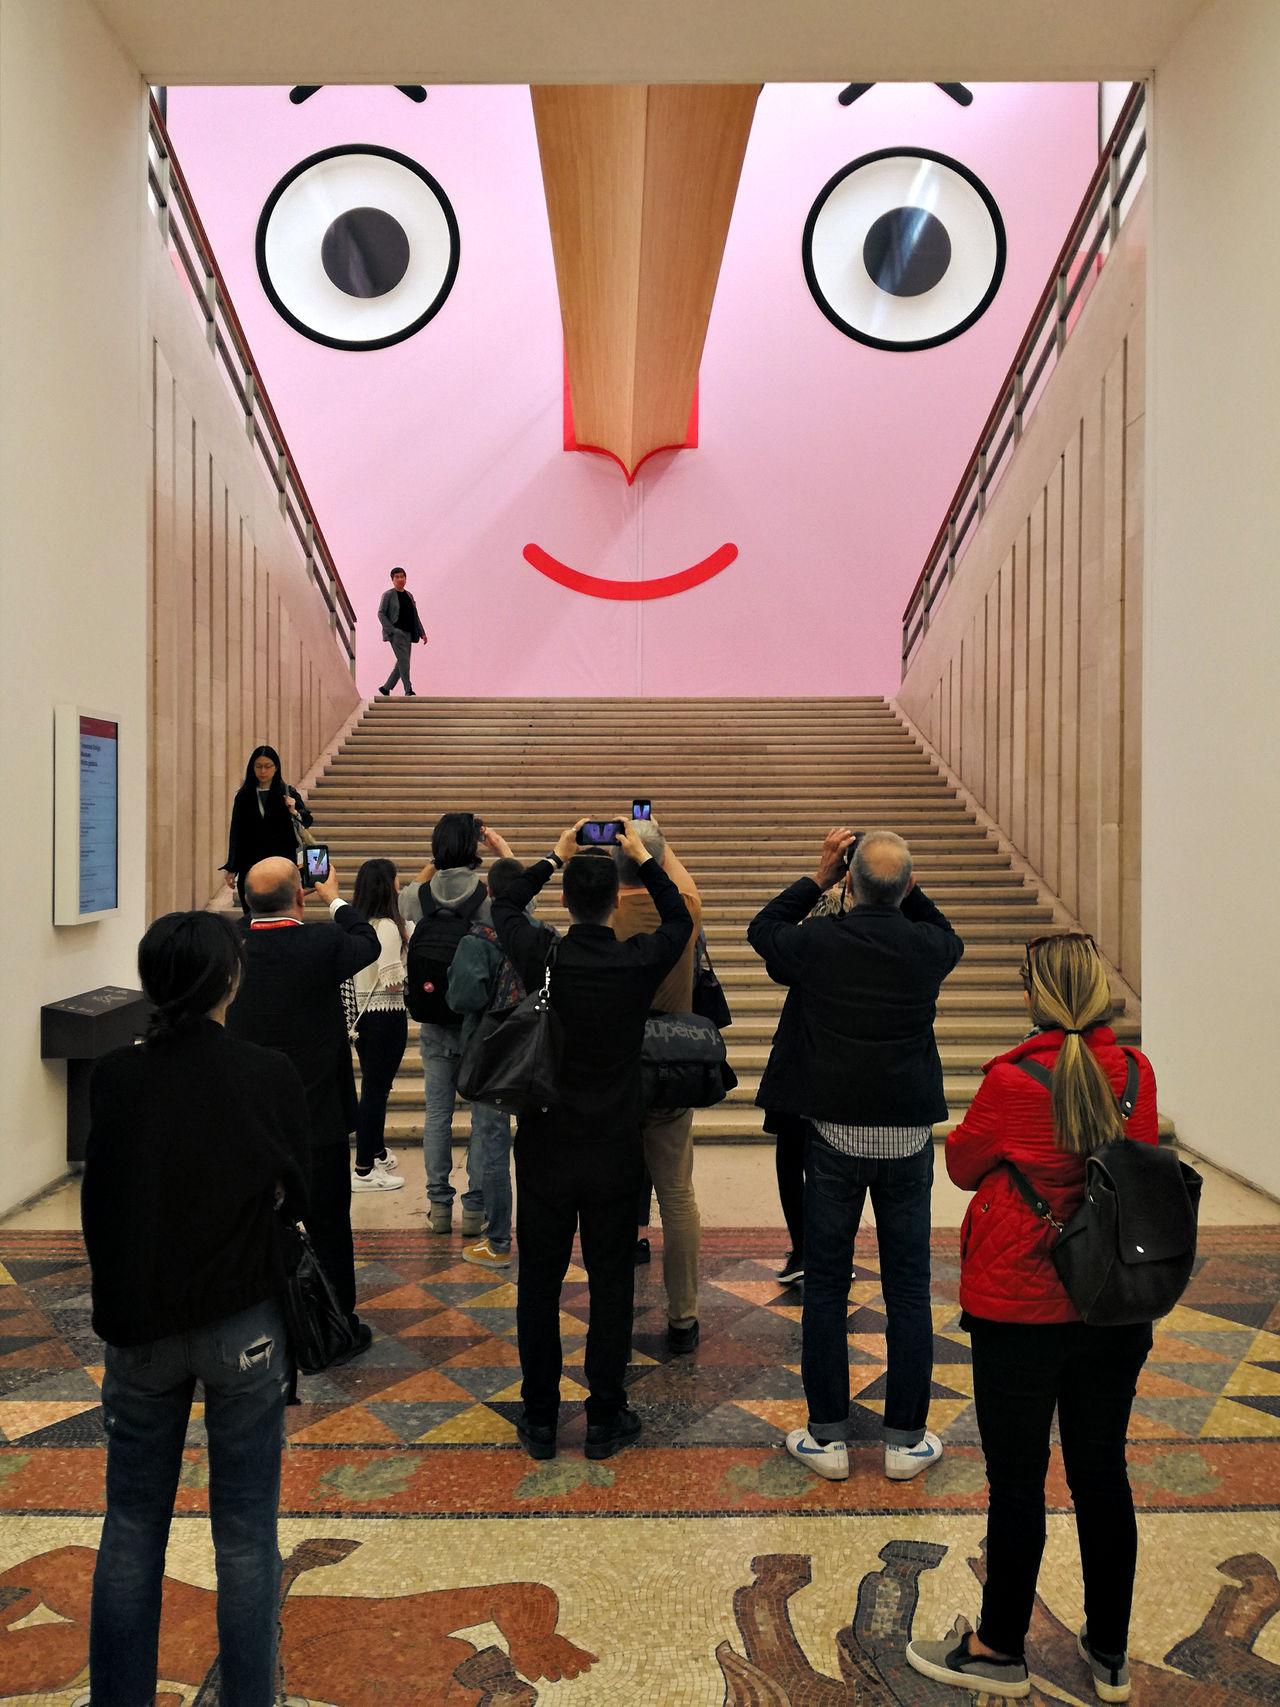 Day Indoors  Large Group Of People Men Milano Design Week 2017 - Ventura Lambrate #salonedelmobile #milanodesignweek #design #milano #milan #venturalambrate #venturadesigndistrict #venturadesign #venturadesignco Ilsalone Ilsalonedelmobile People Real People Standing Triennale Women